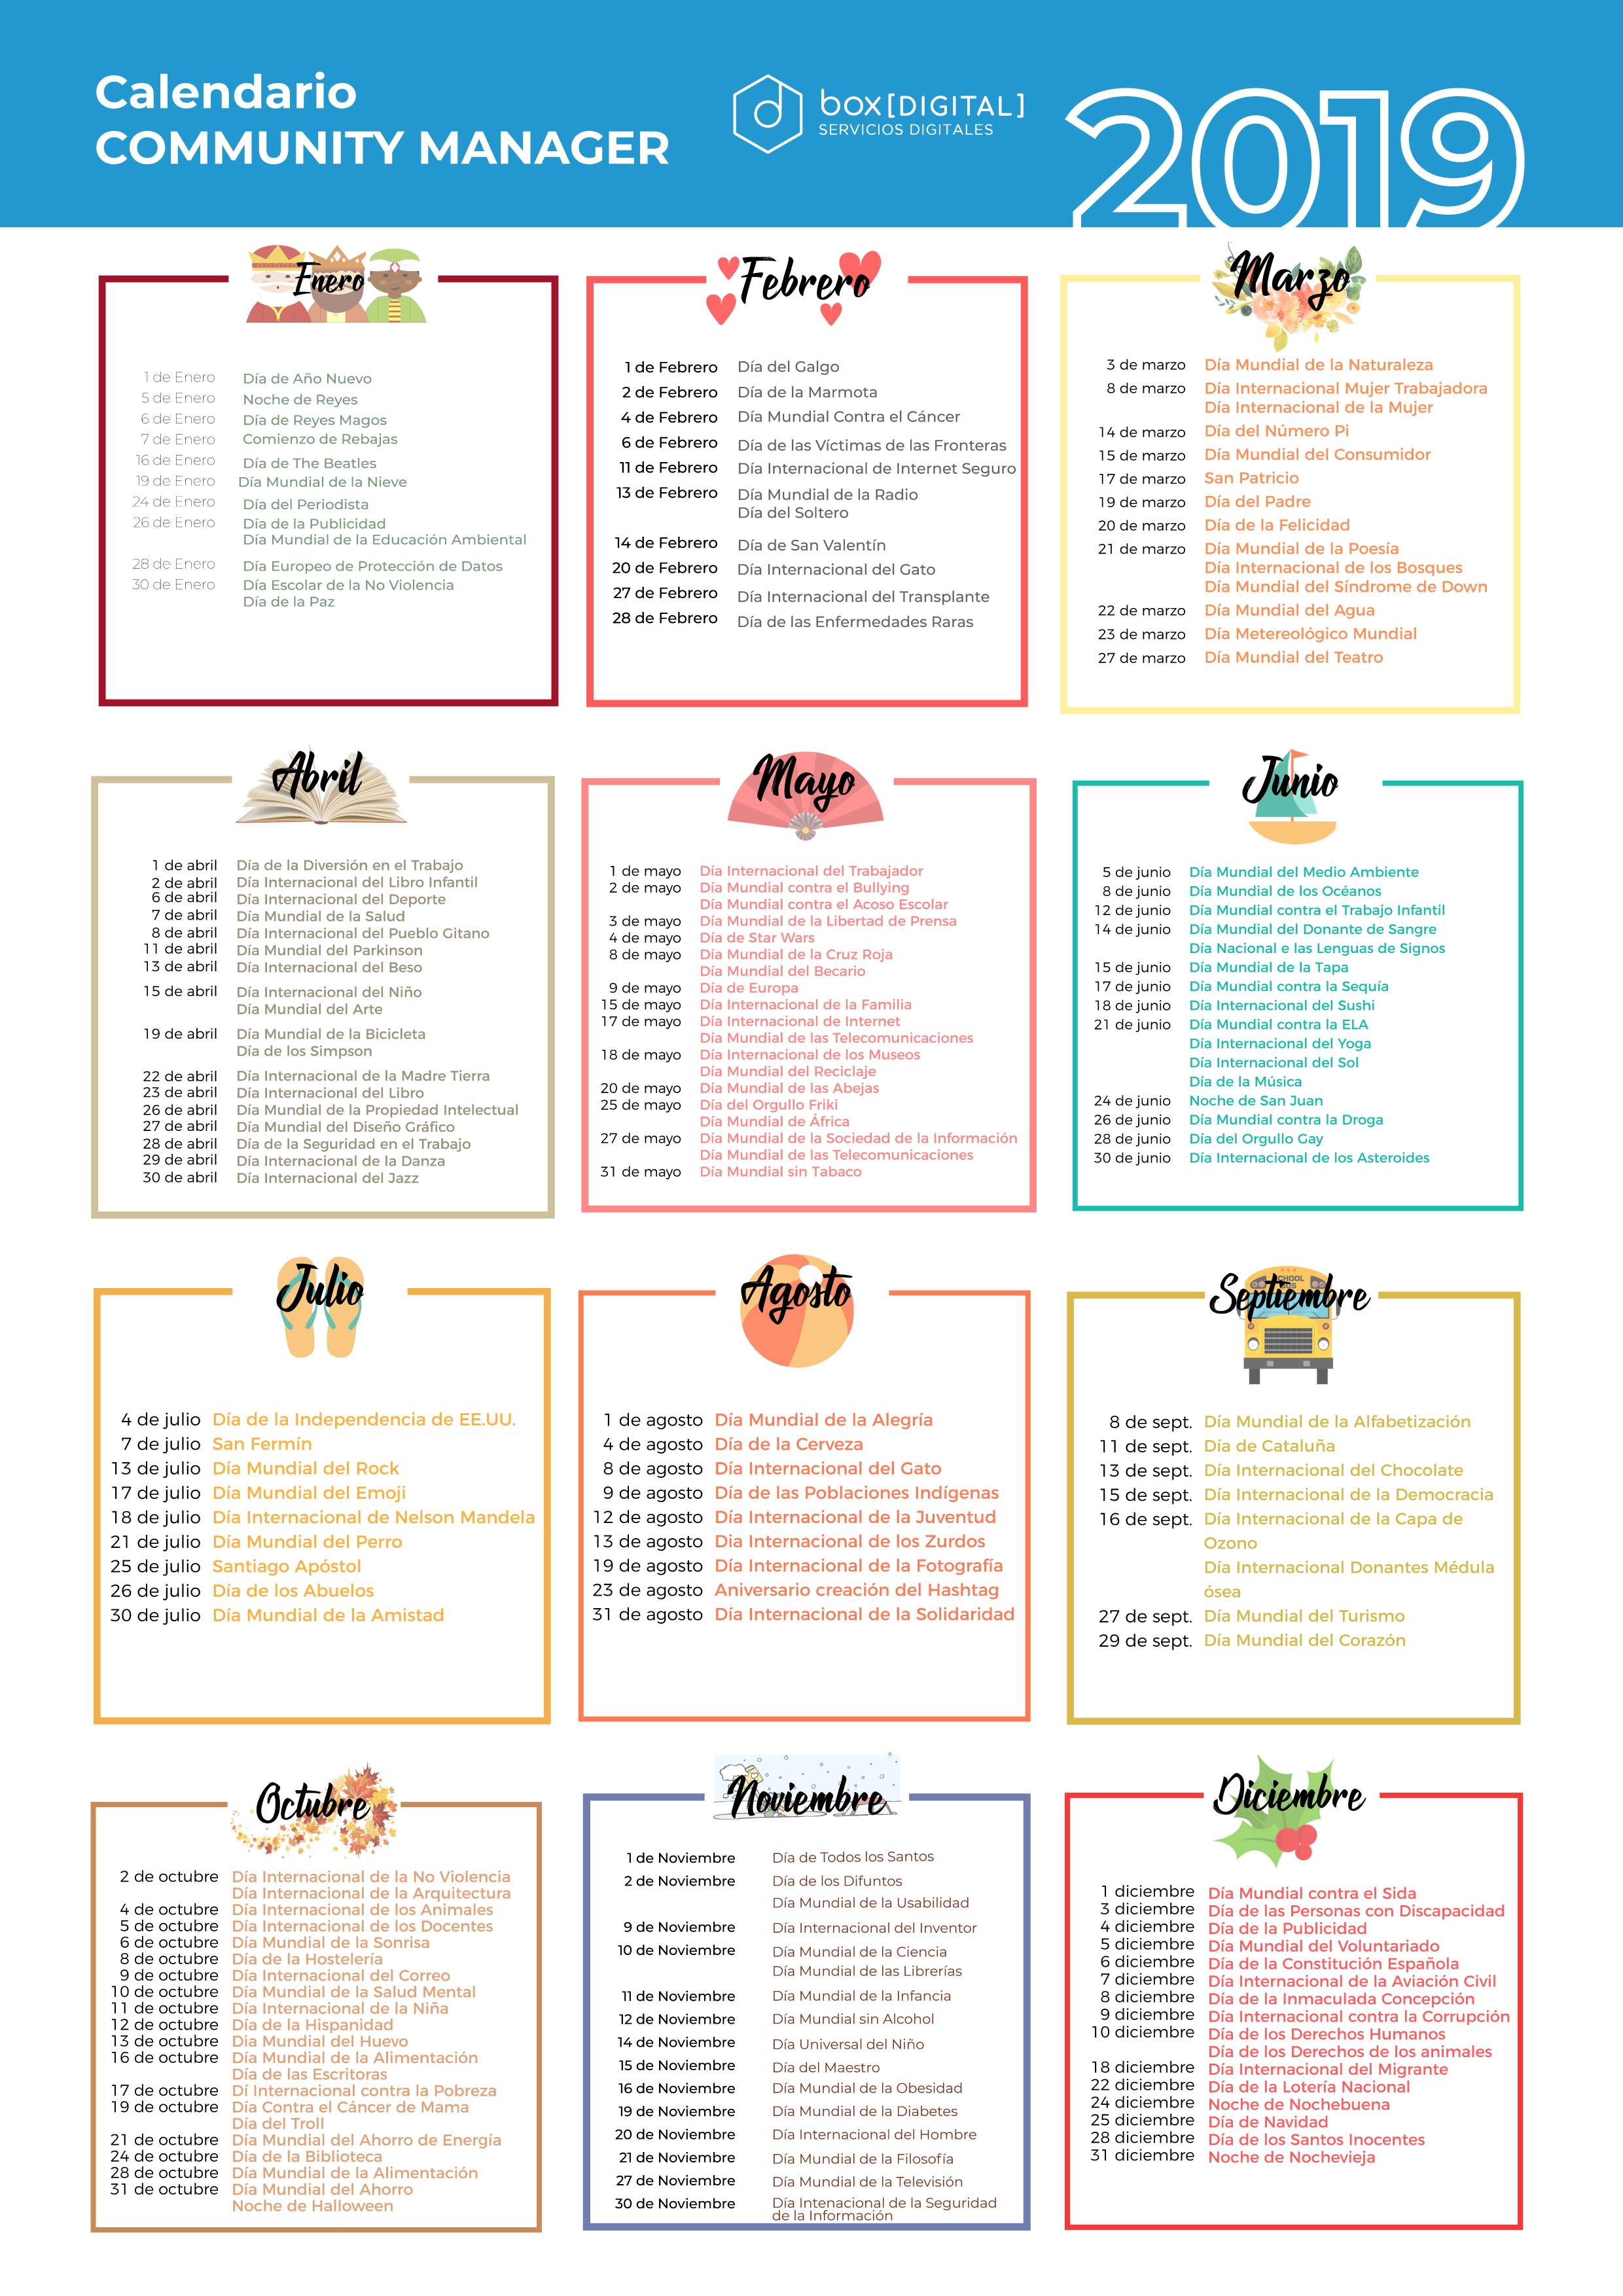 calendario-community-manager